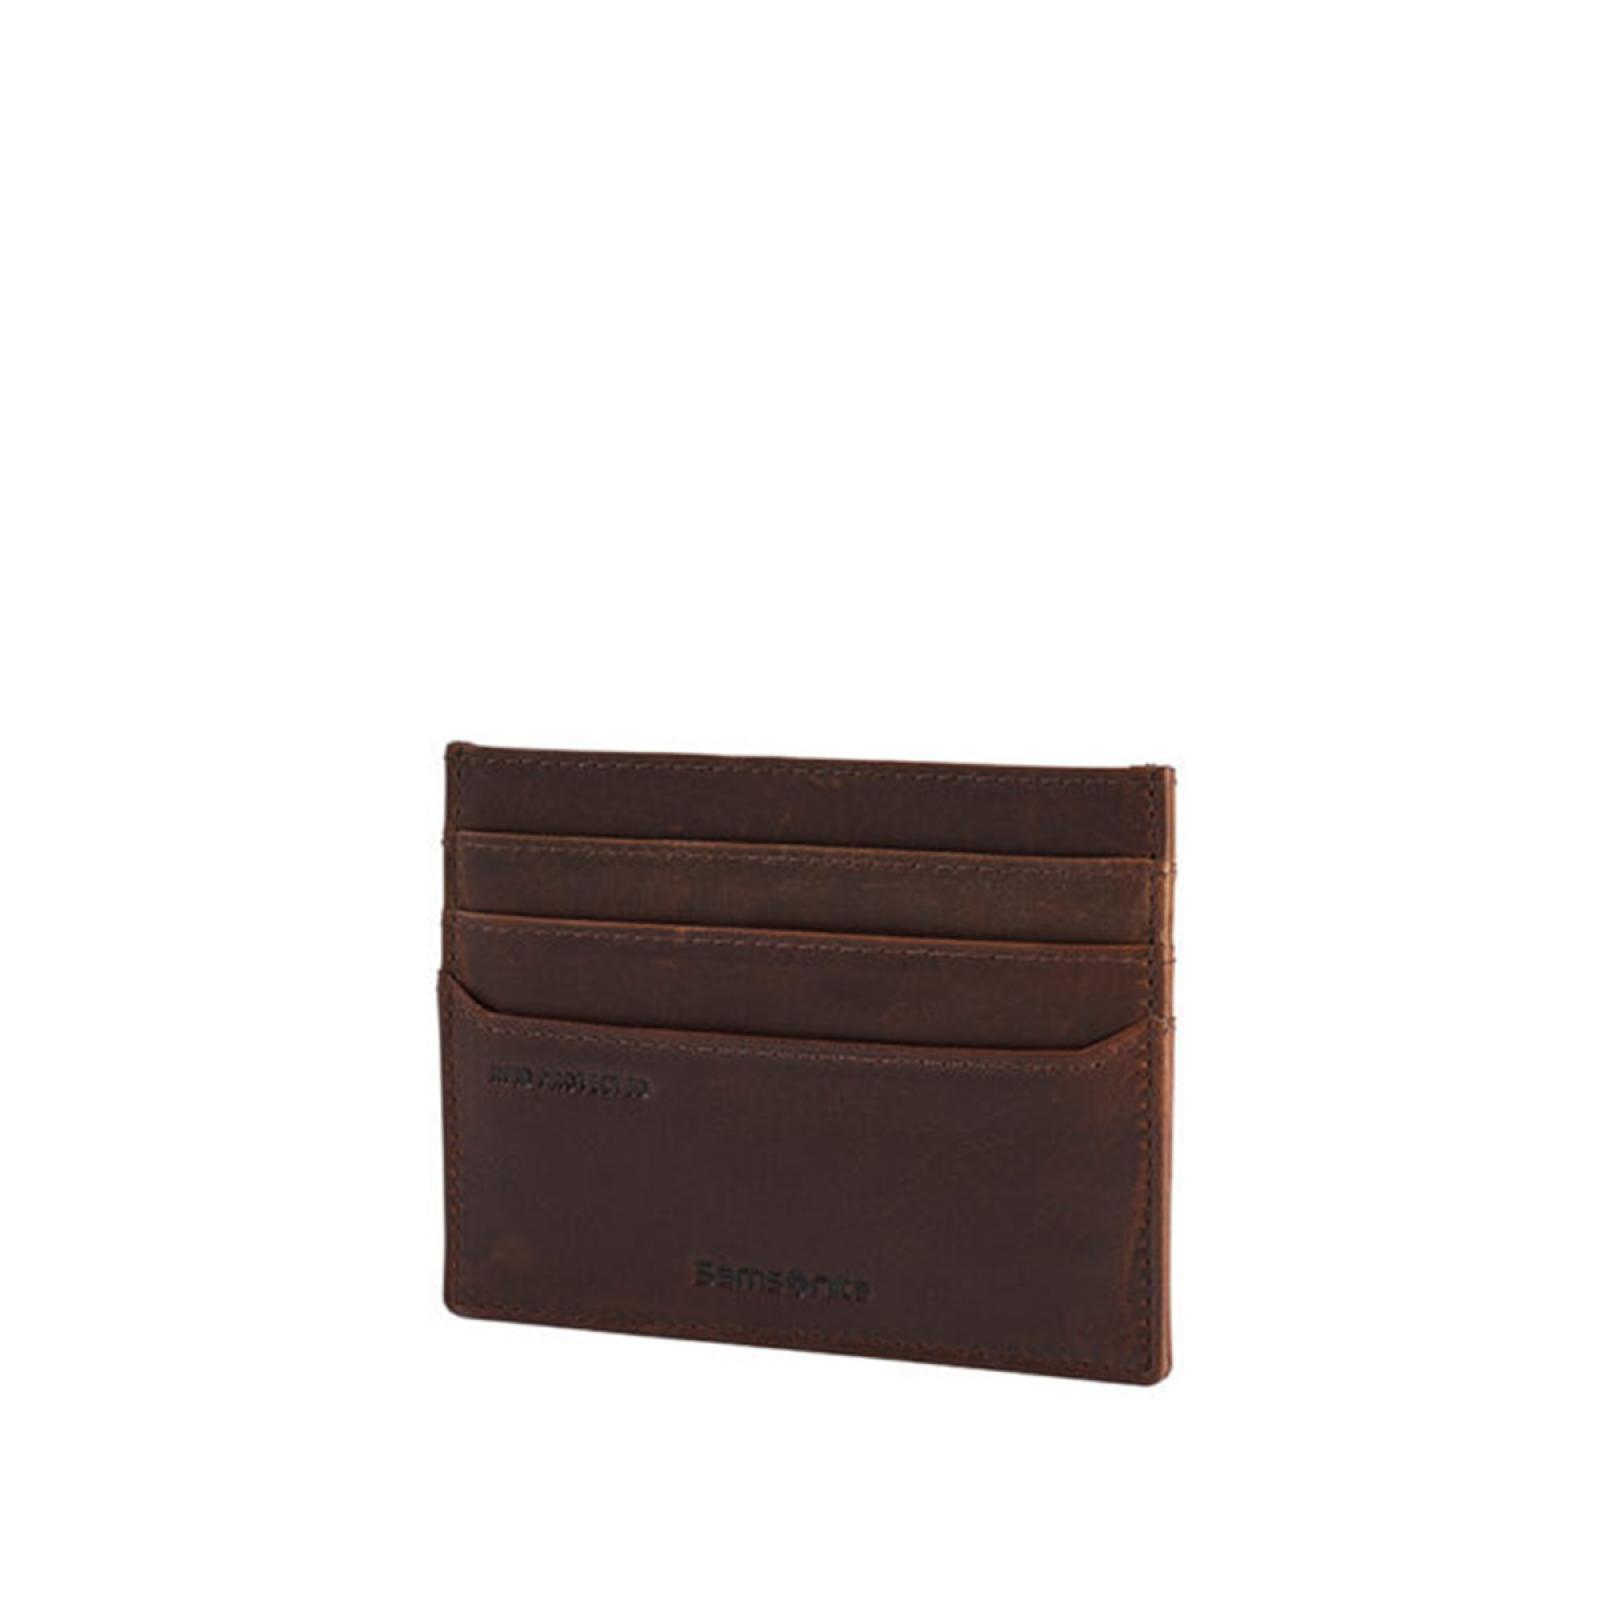 Samsonite Credit card holder with 6 slots Oleo - 1